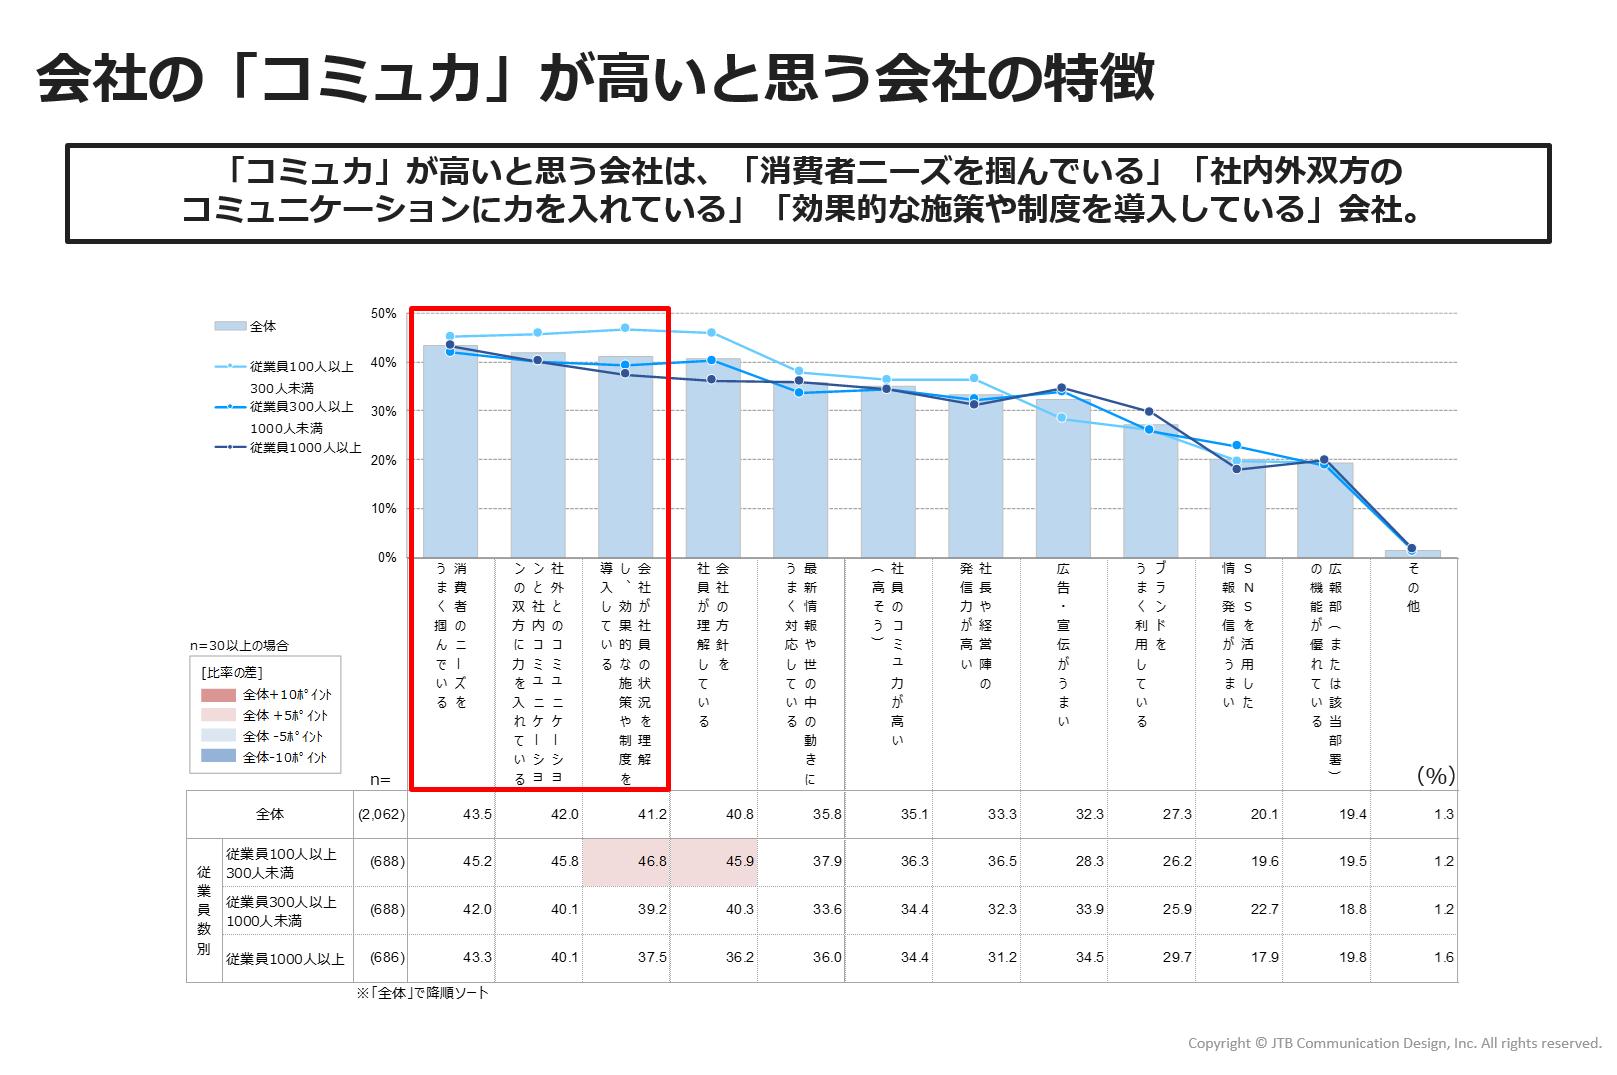 https://www.jtbcom.co.jp/article/img/commu-figure8.png